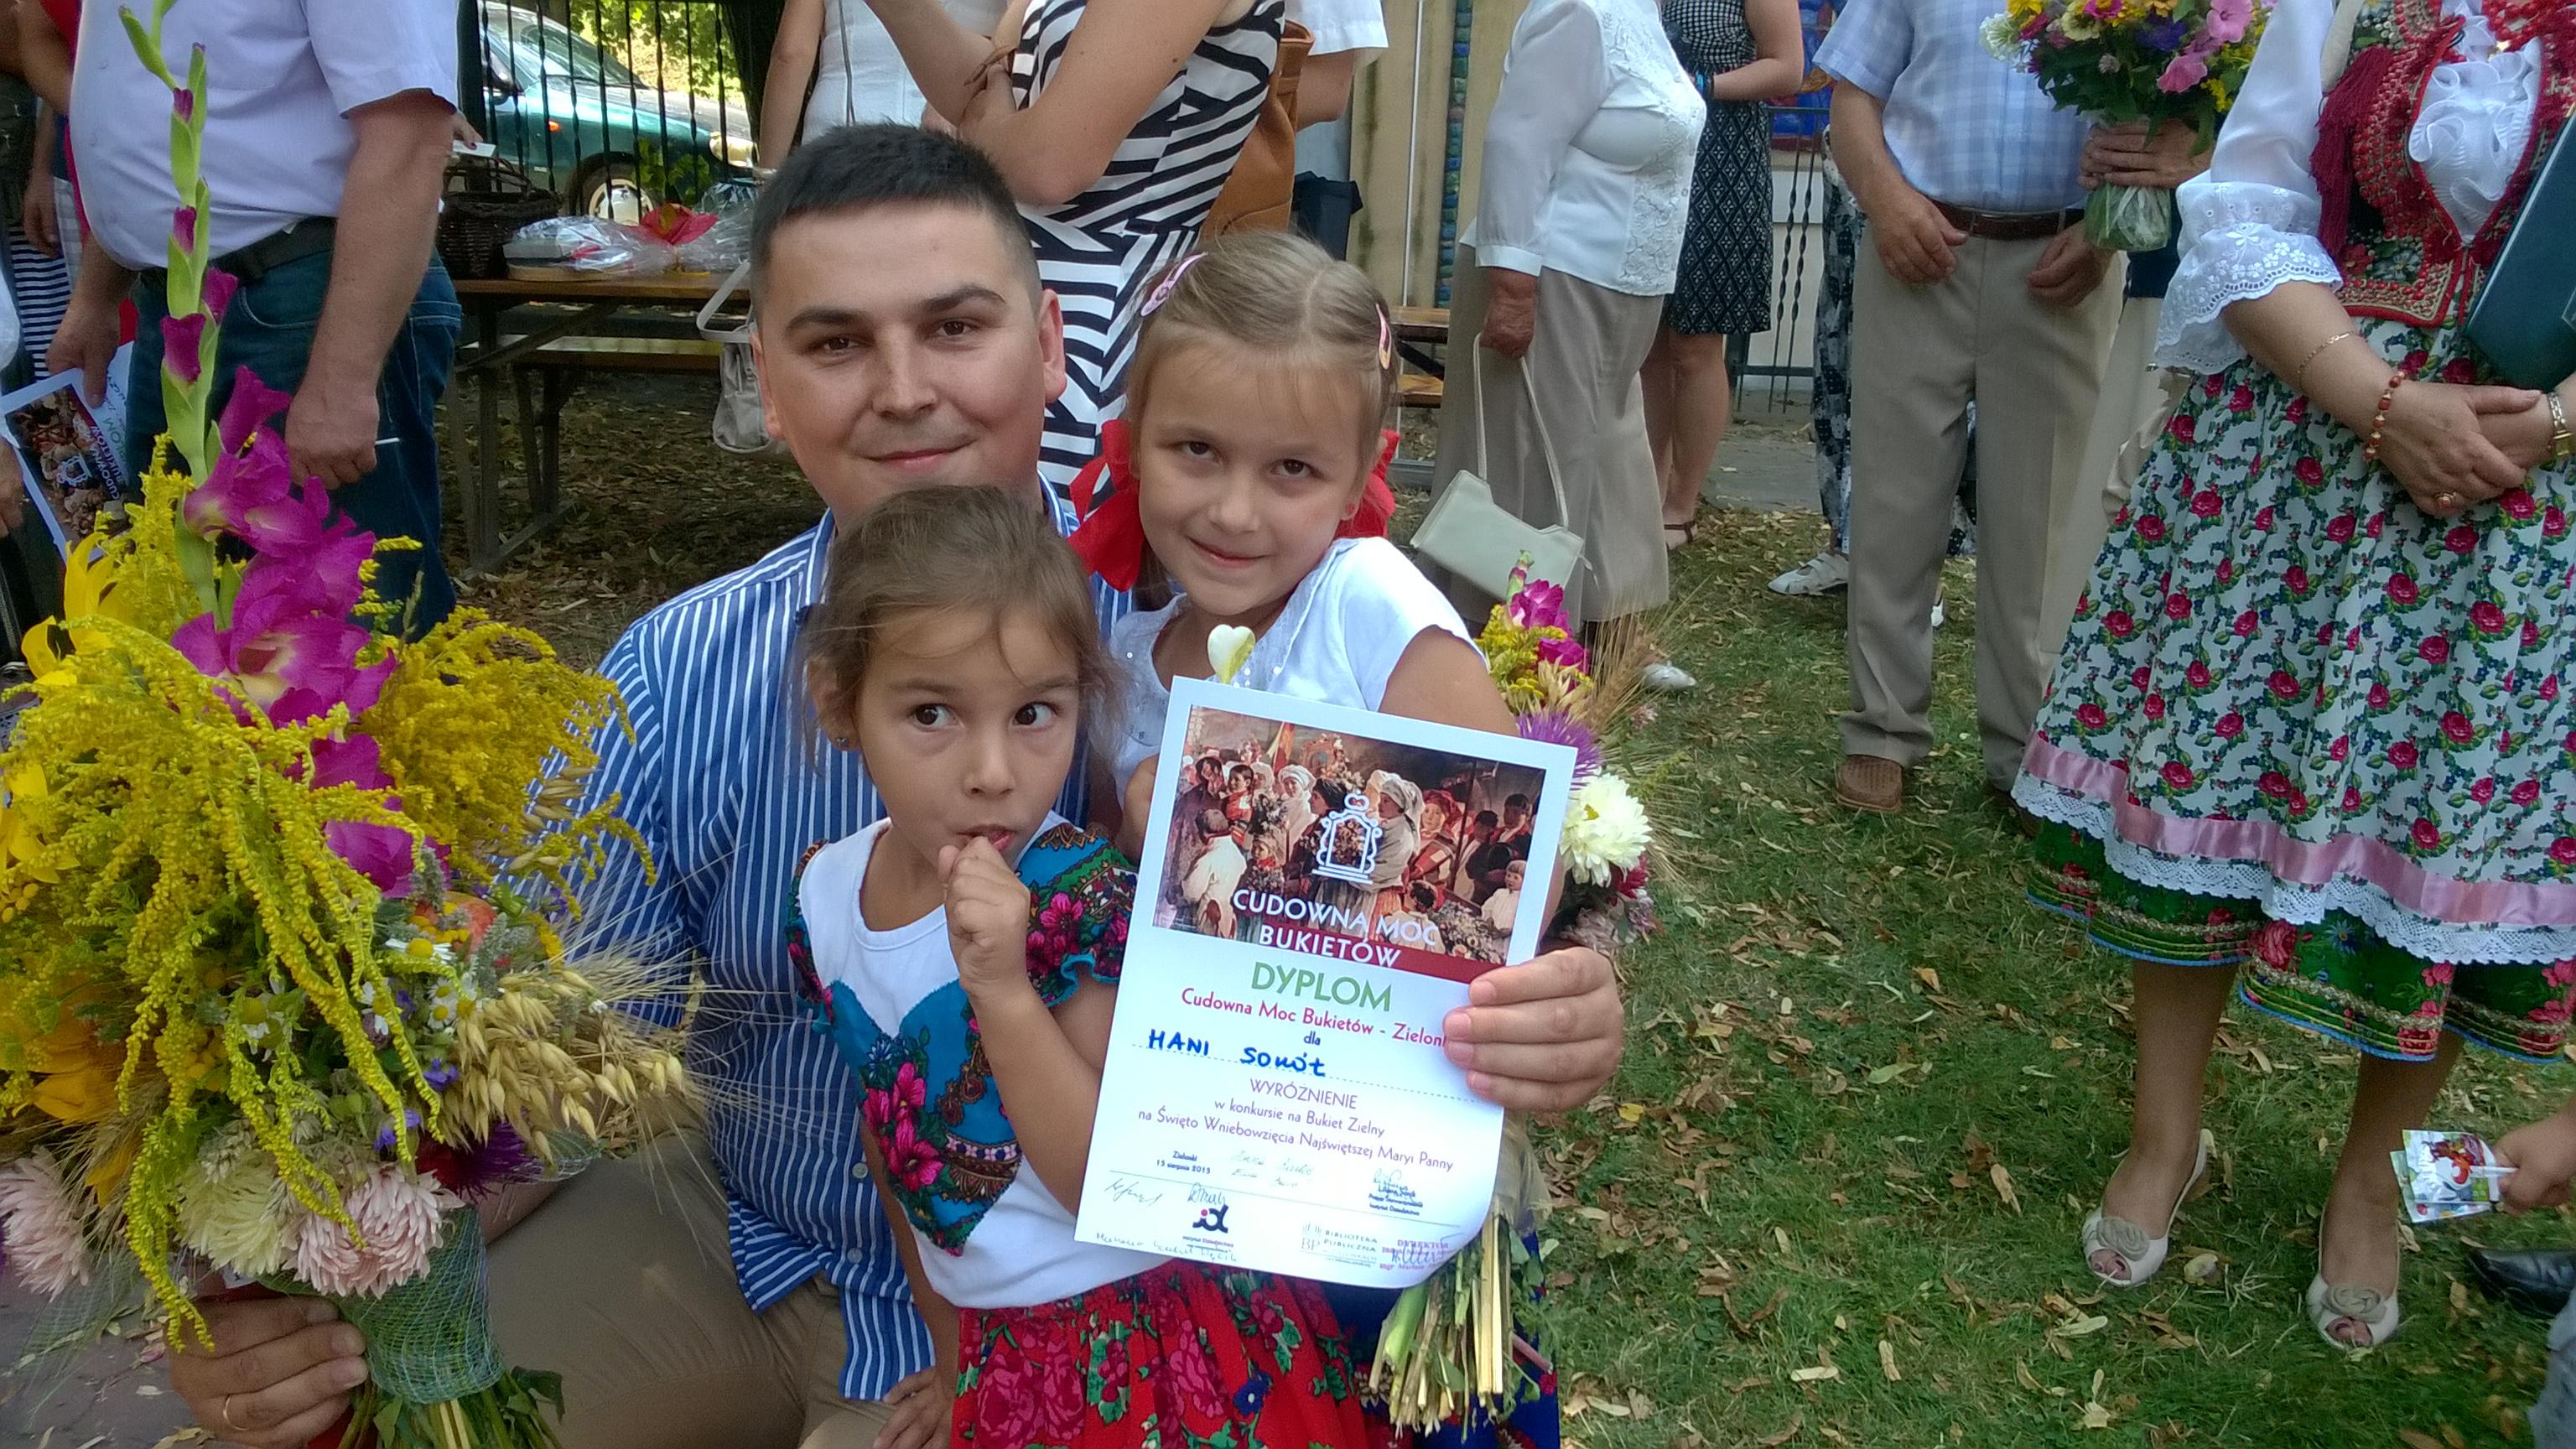 15.08.2015 Konkurs w Zielonkach (100)